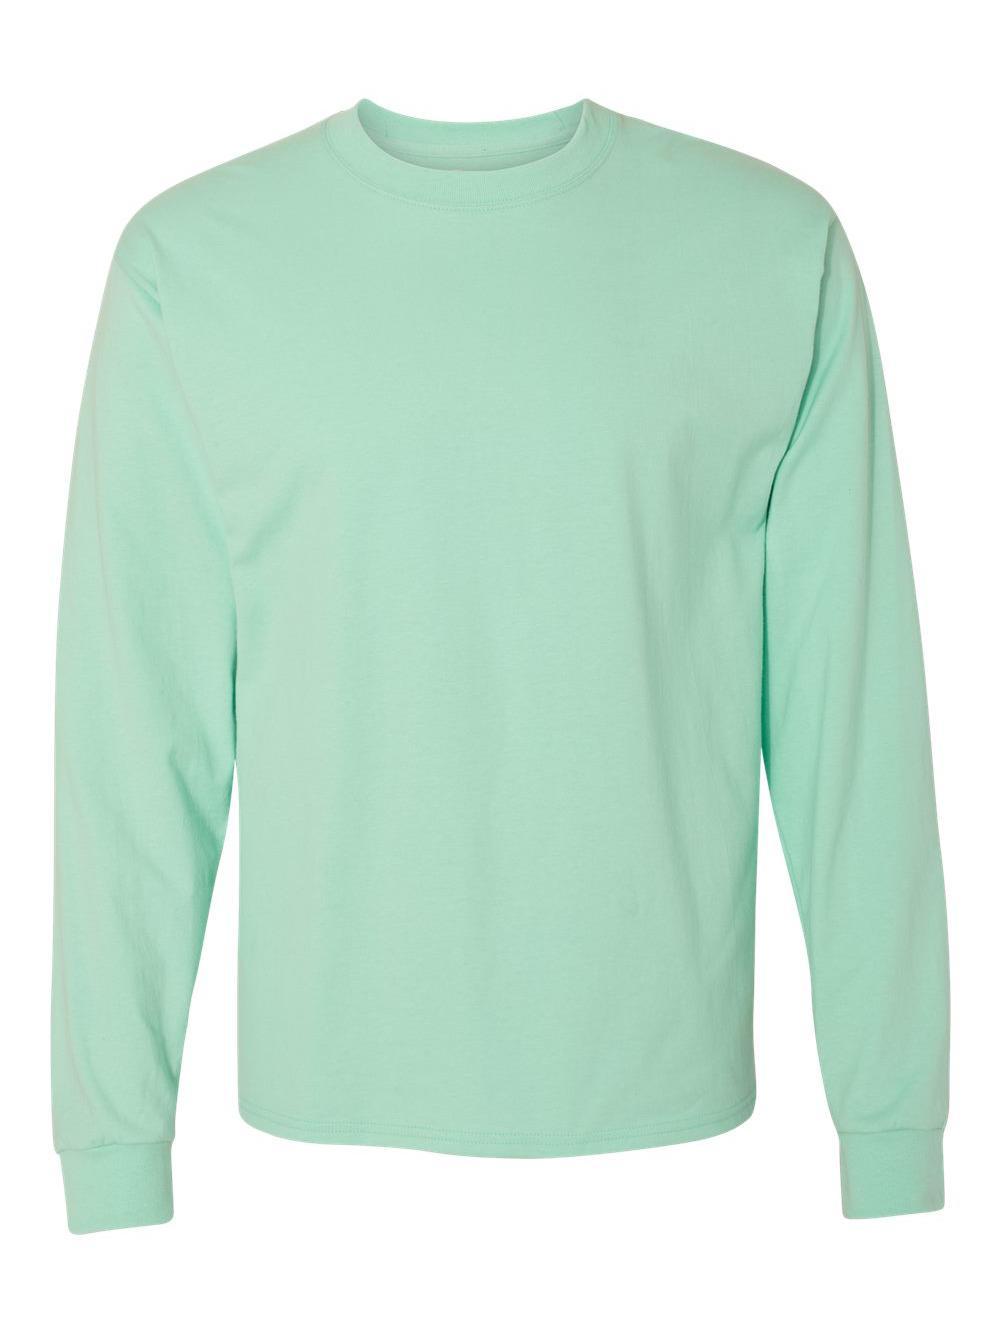 Hanes-Beefy-T-Long-Sleeve-T-Shirt-5186 thumbnail 21